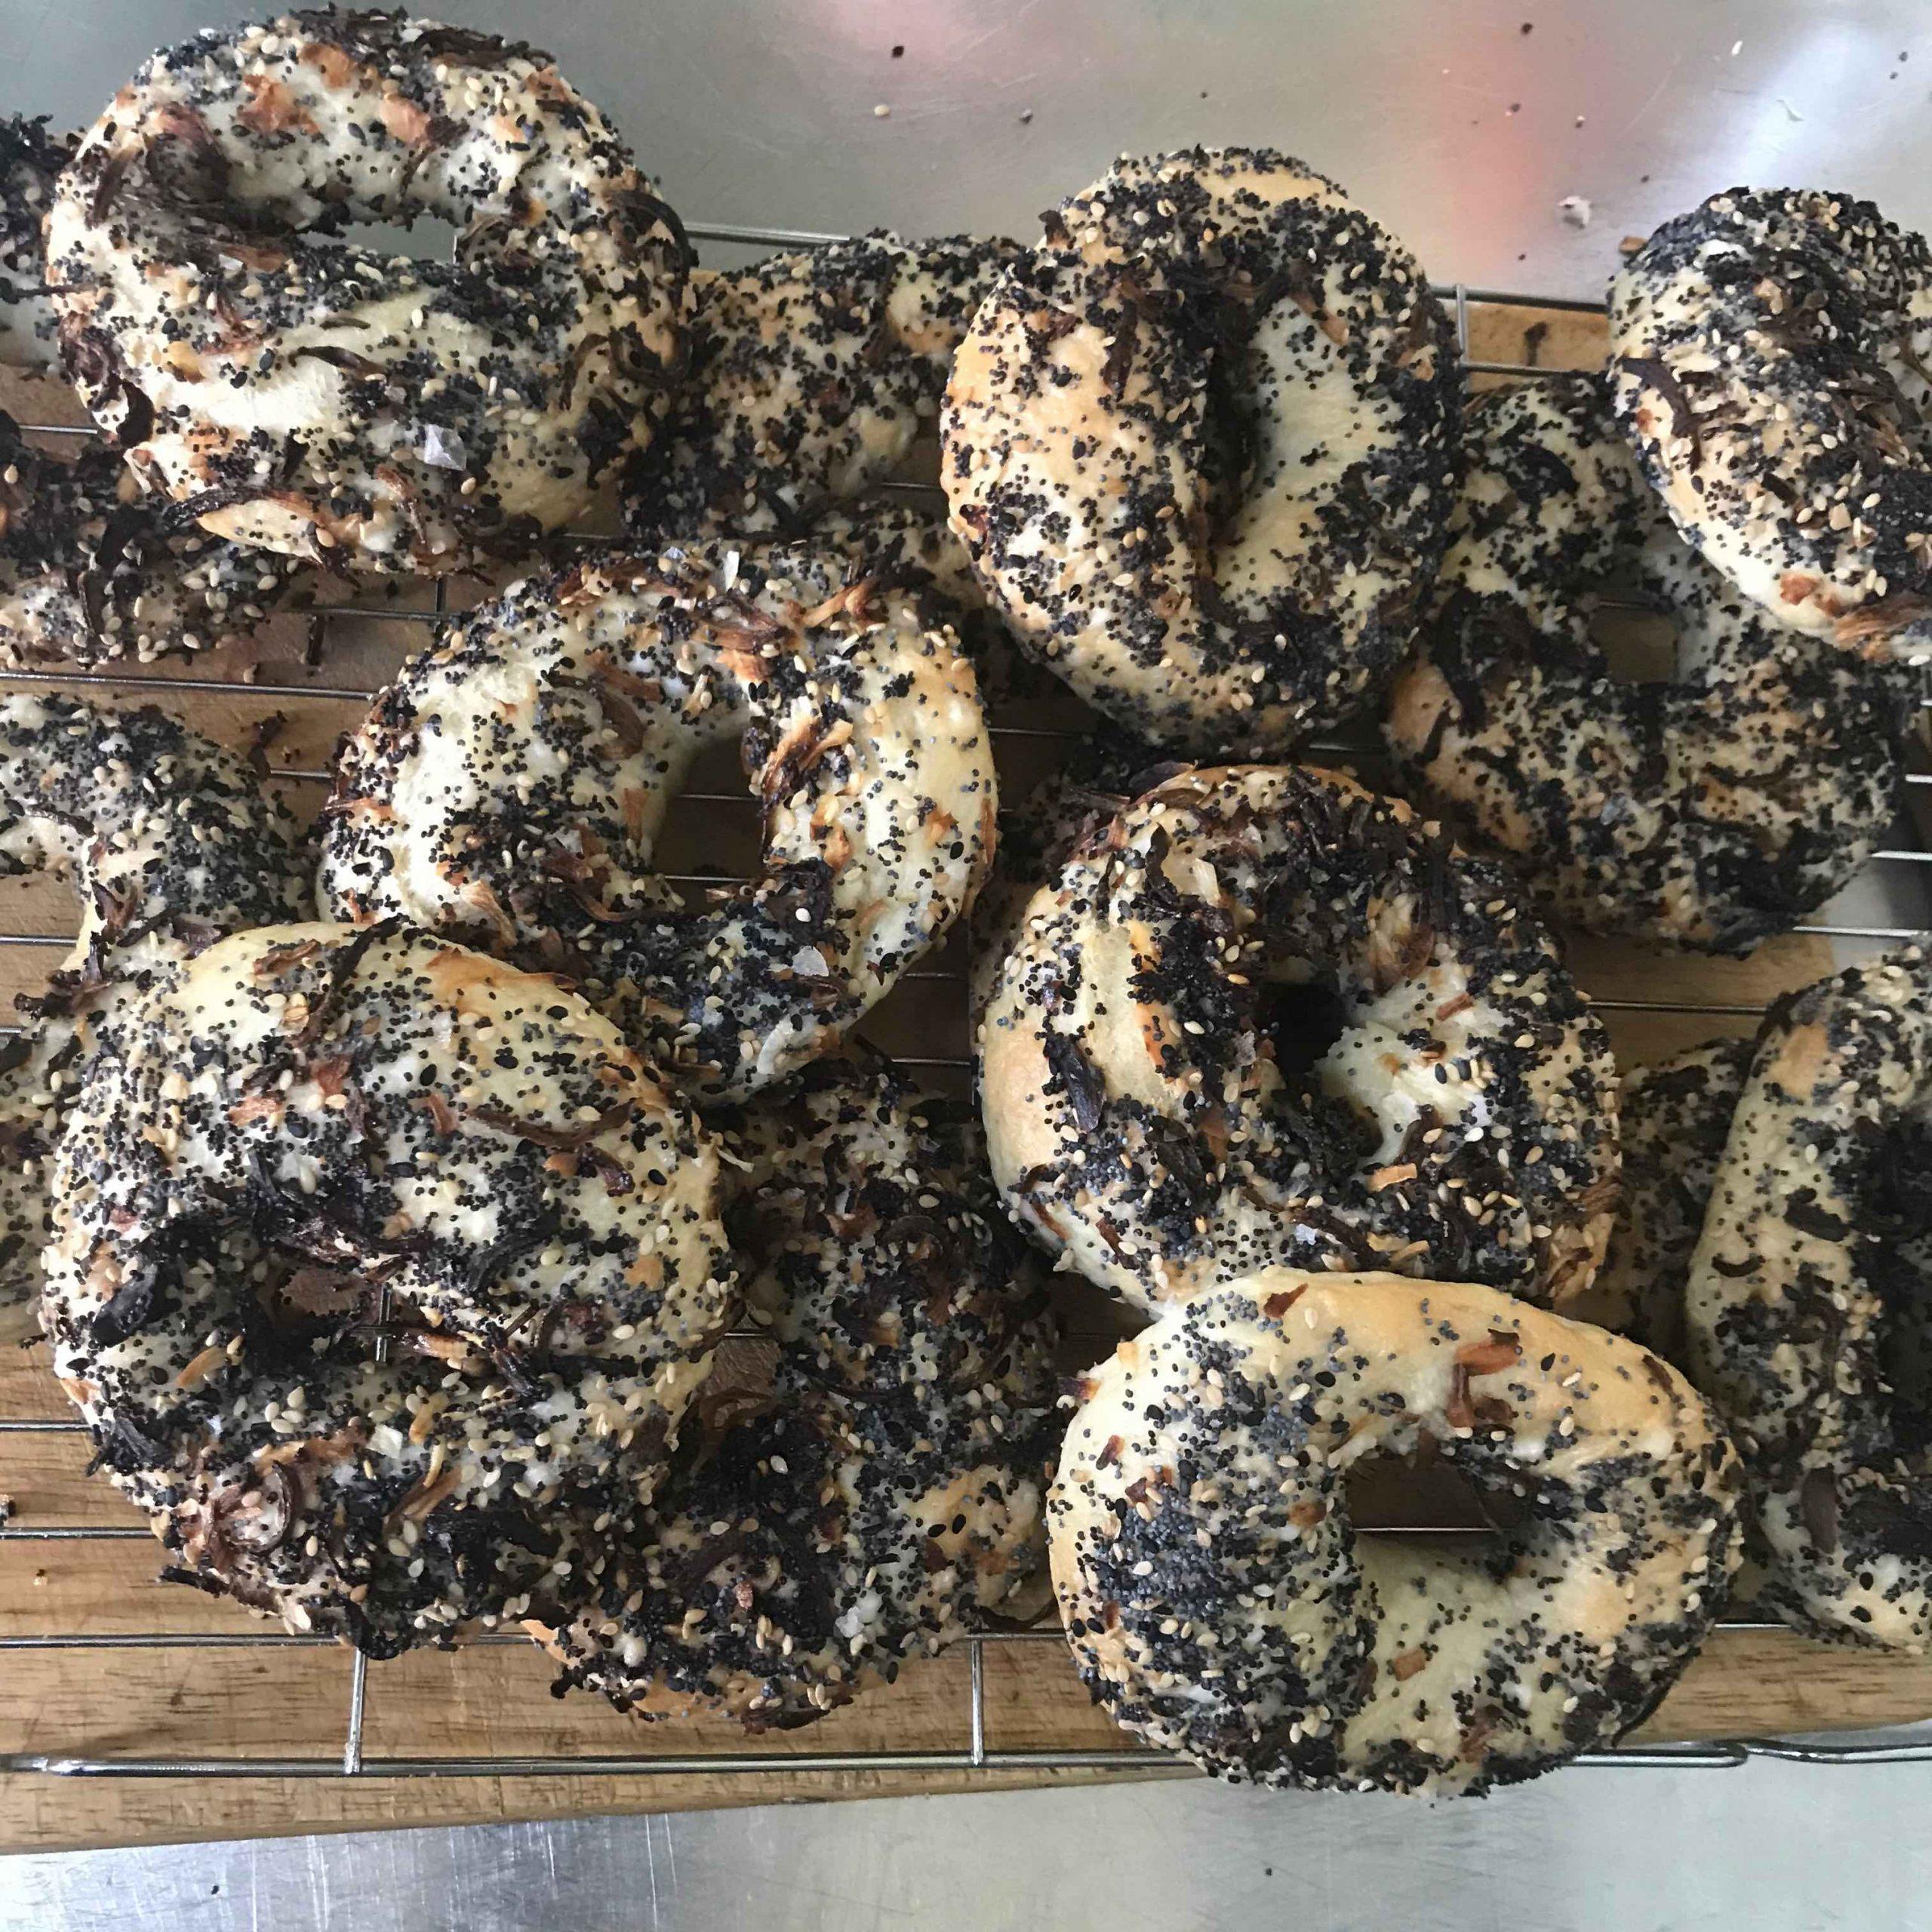 Baker's Bagels